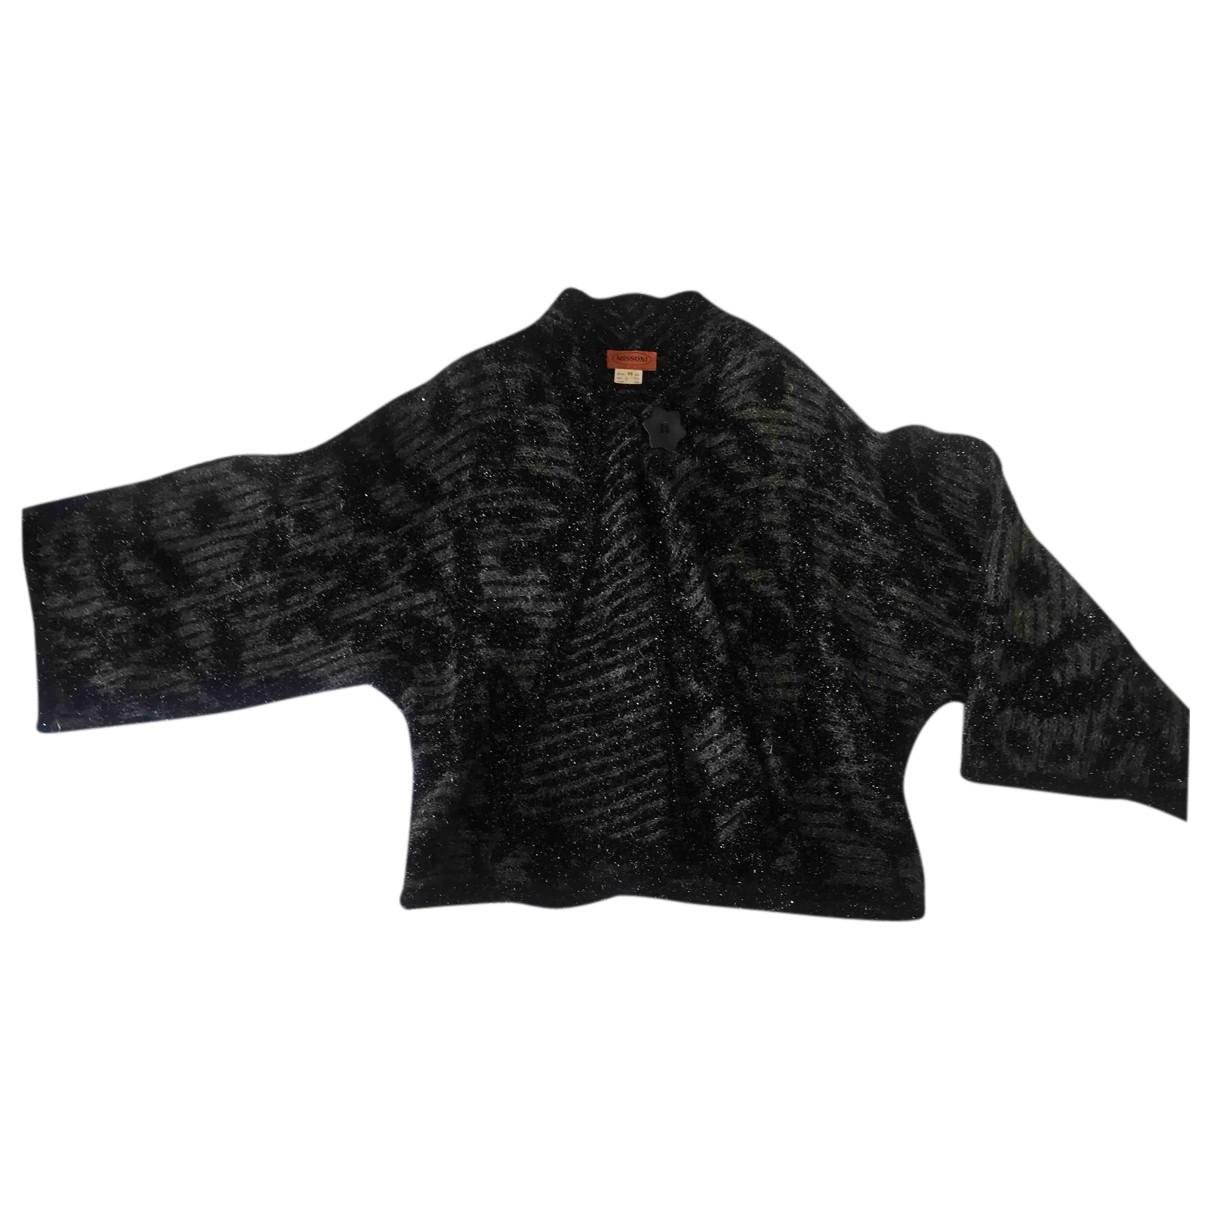 Missoni N Anthracite Knitwear for Women M International